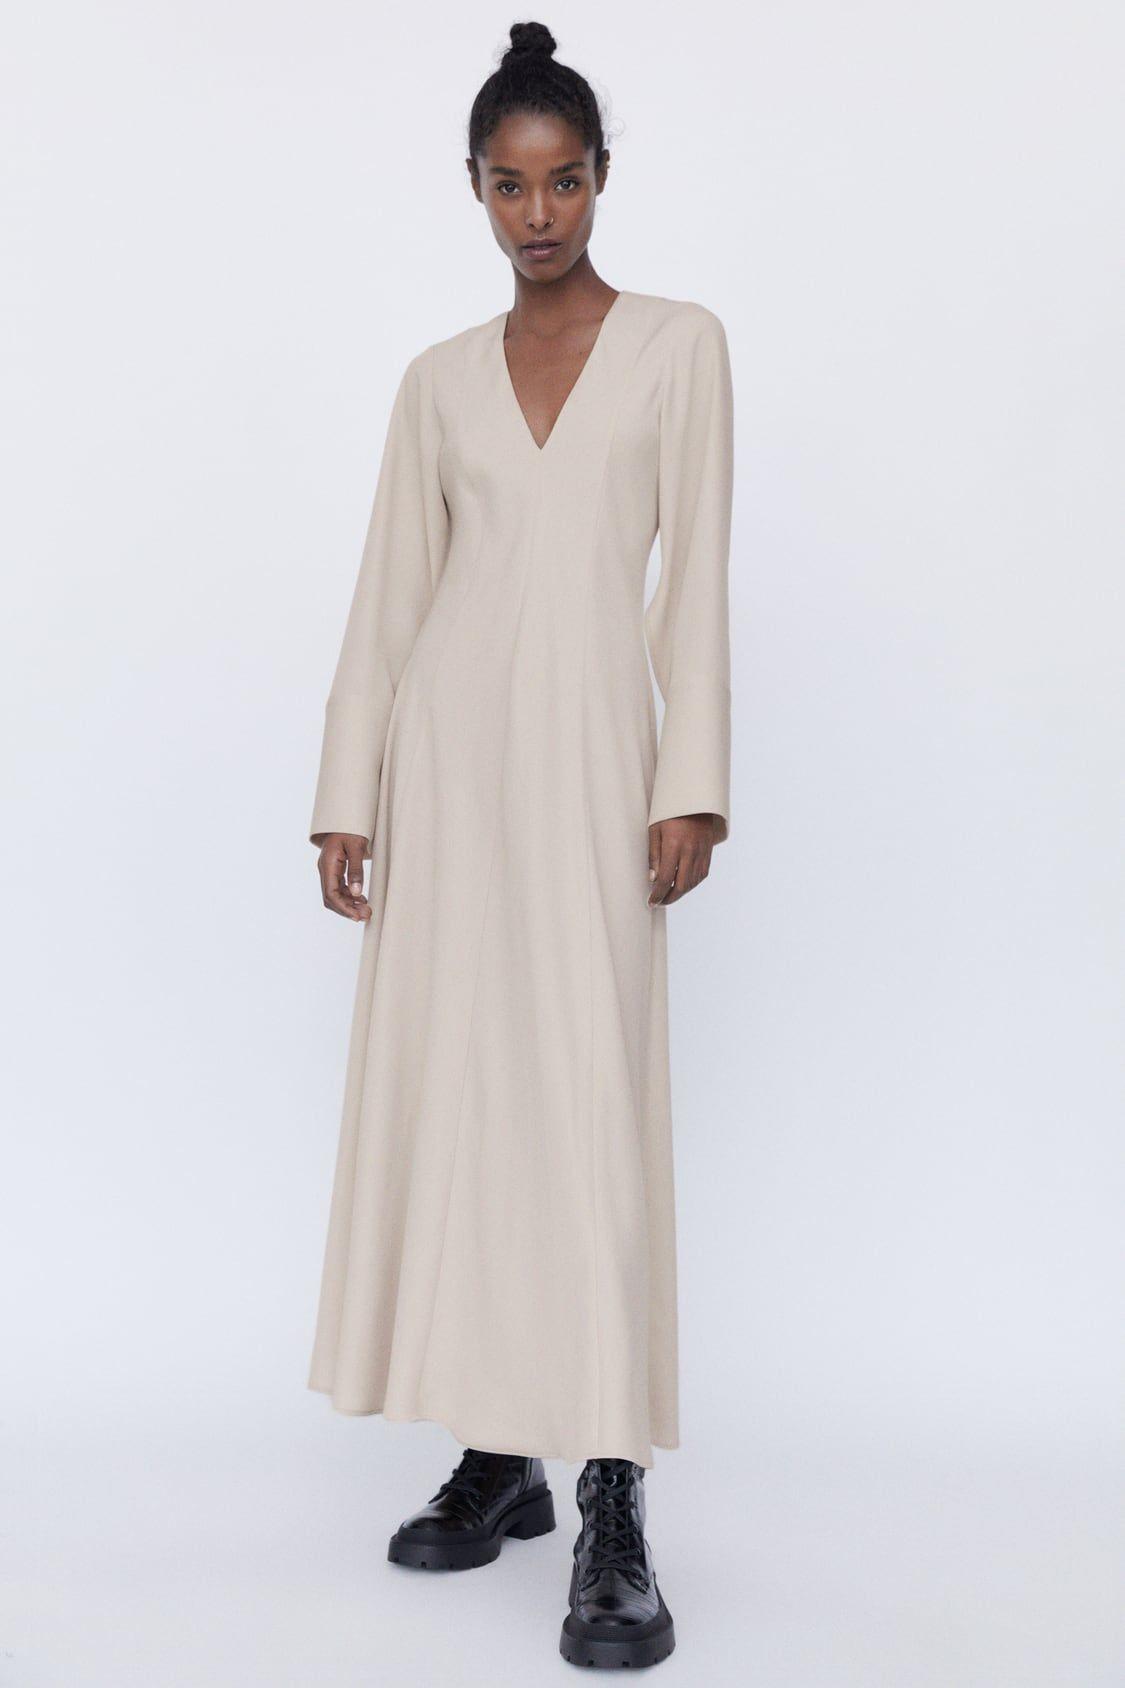 zara - woman - midi dress with voluminous sleeves | ballrock